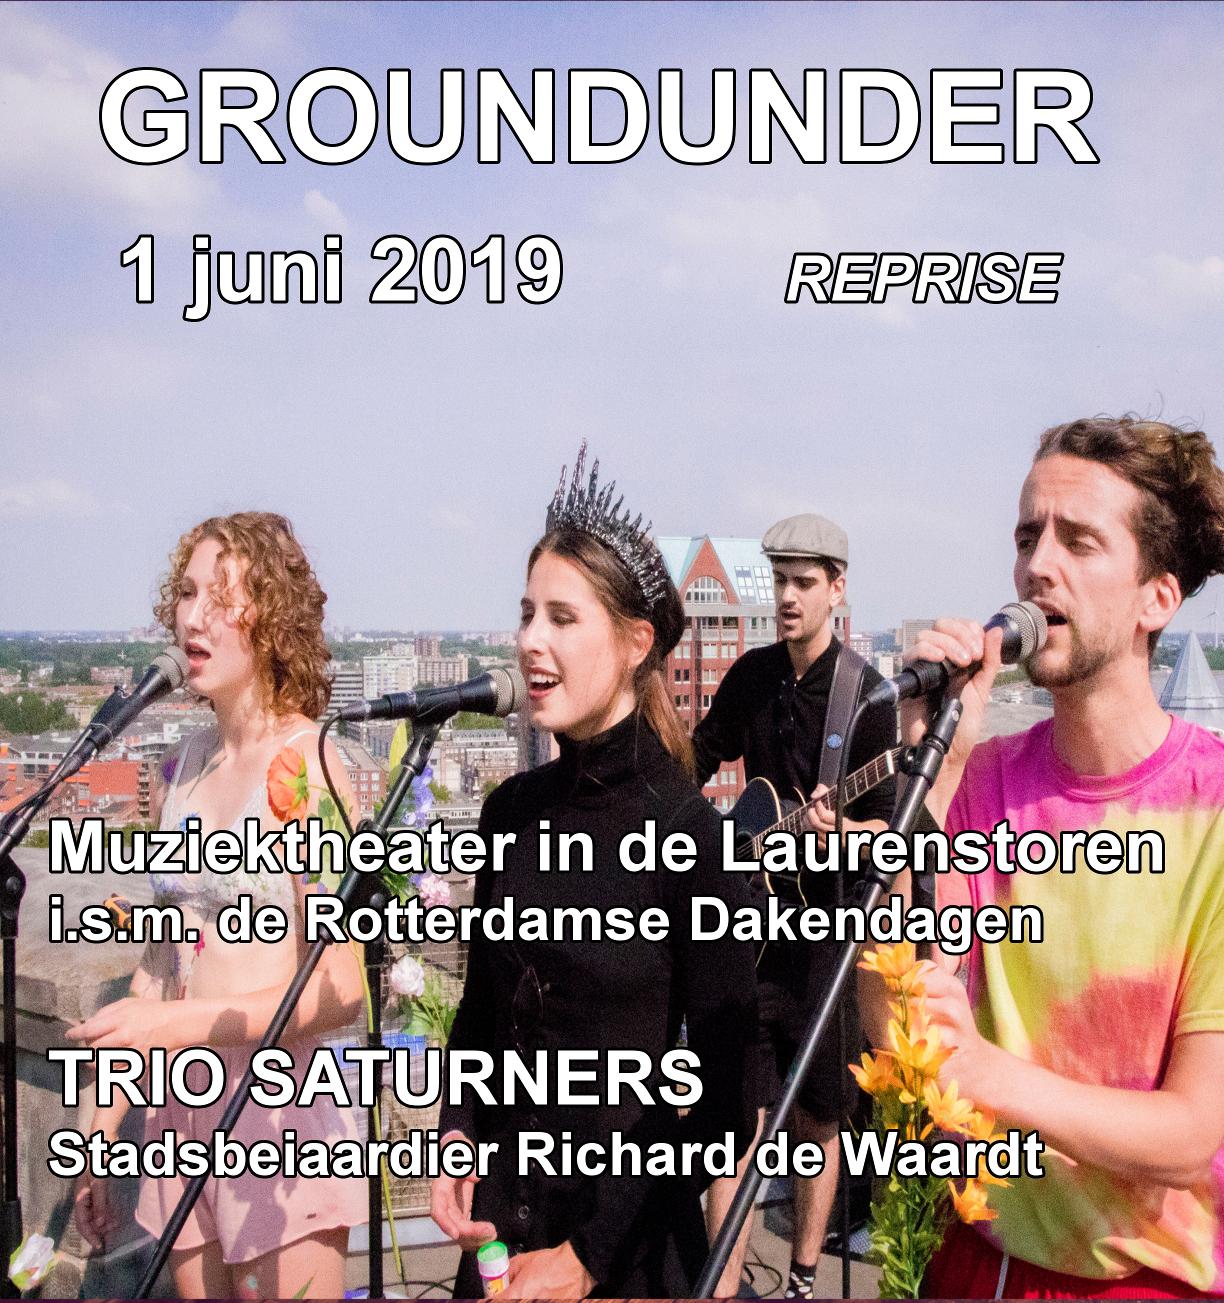 002 - Groundunder.jpg